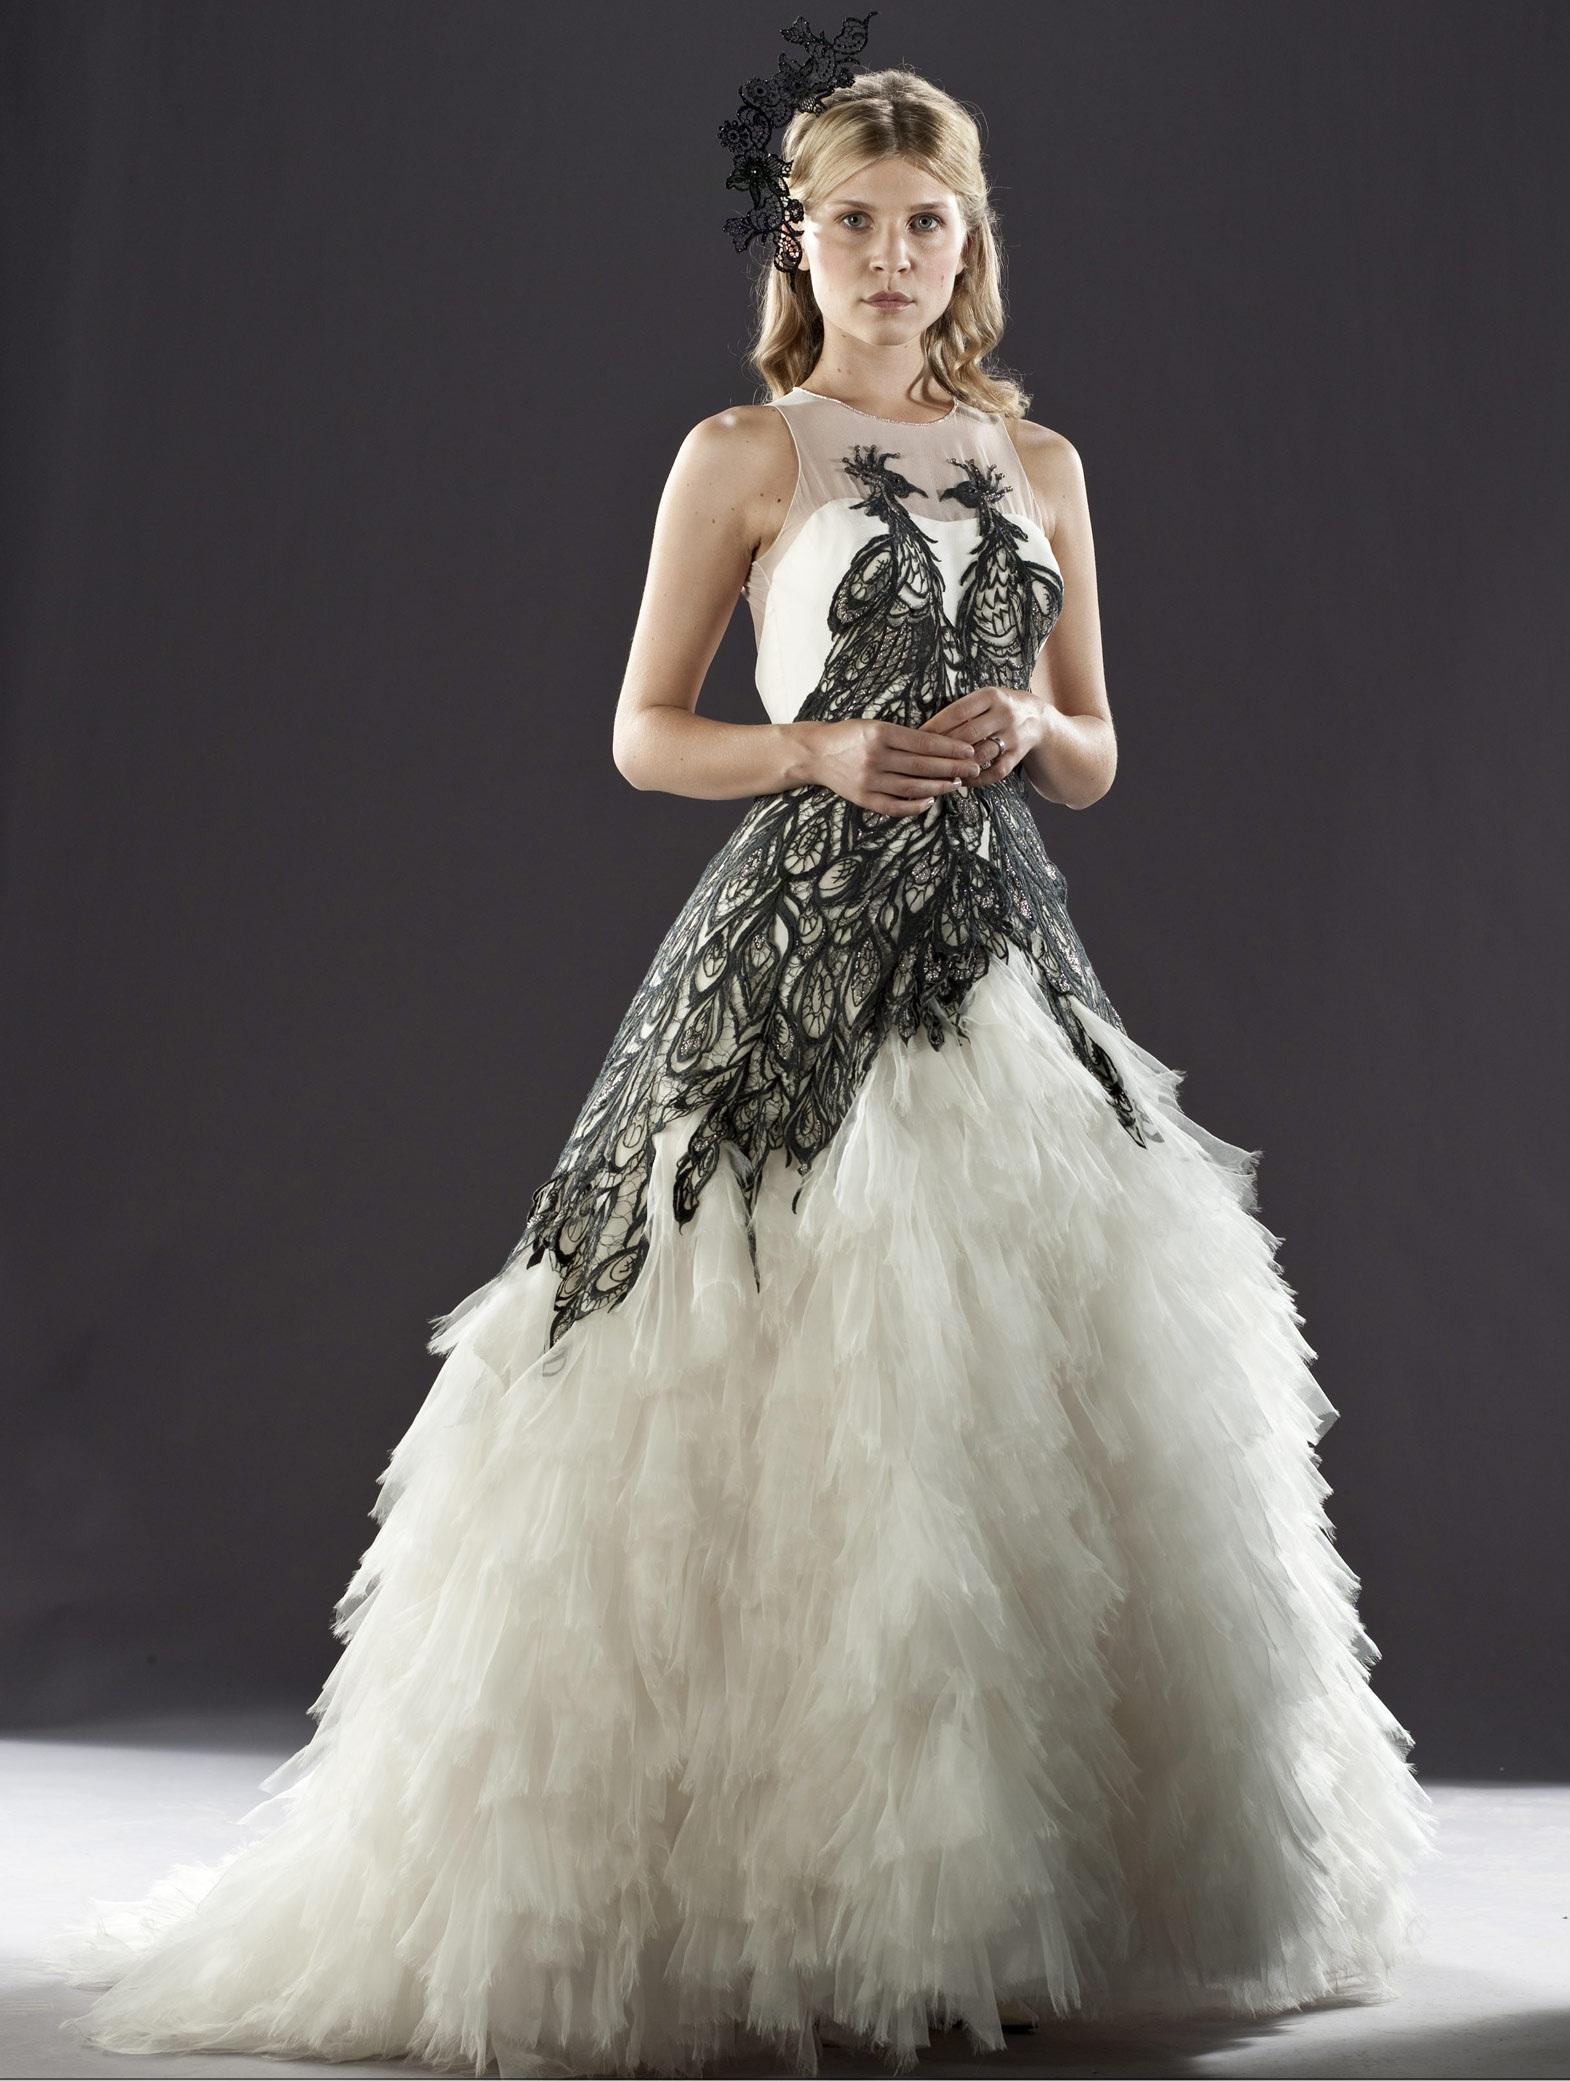 https://vignette.wikia.nocookie.net/harrypotter/images/0/01/DH1_Fleur_dela_Cour_in_her_wedding_gown_01.jpg/revision/latest?cb=20110202094234